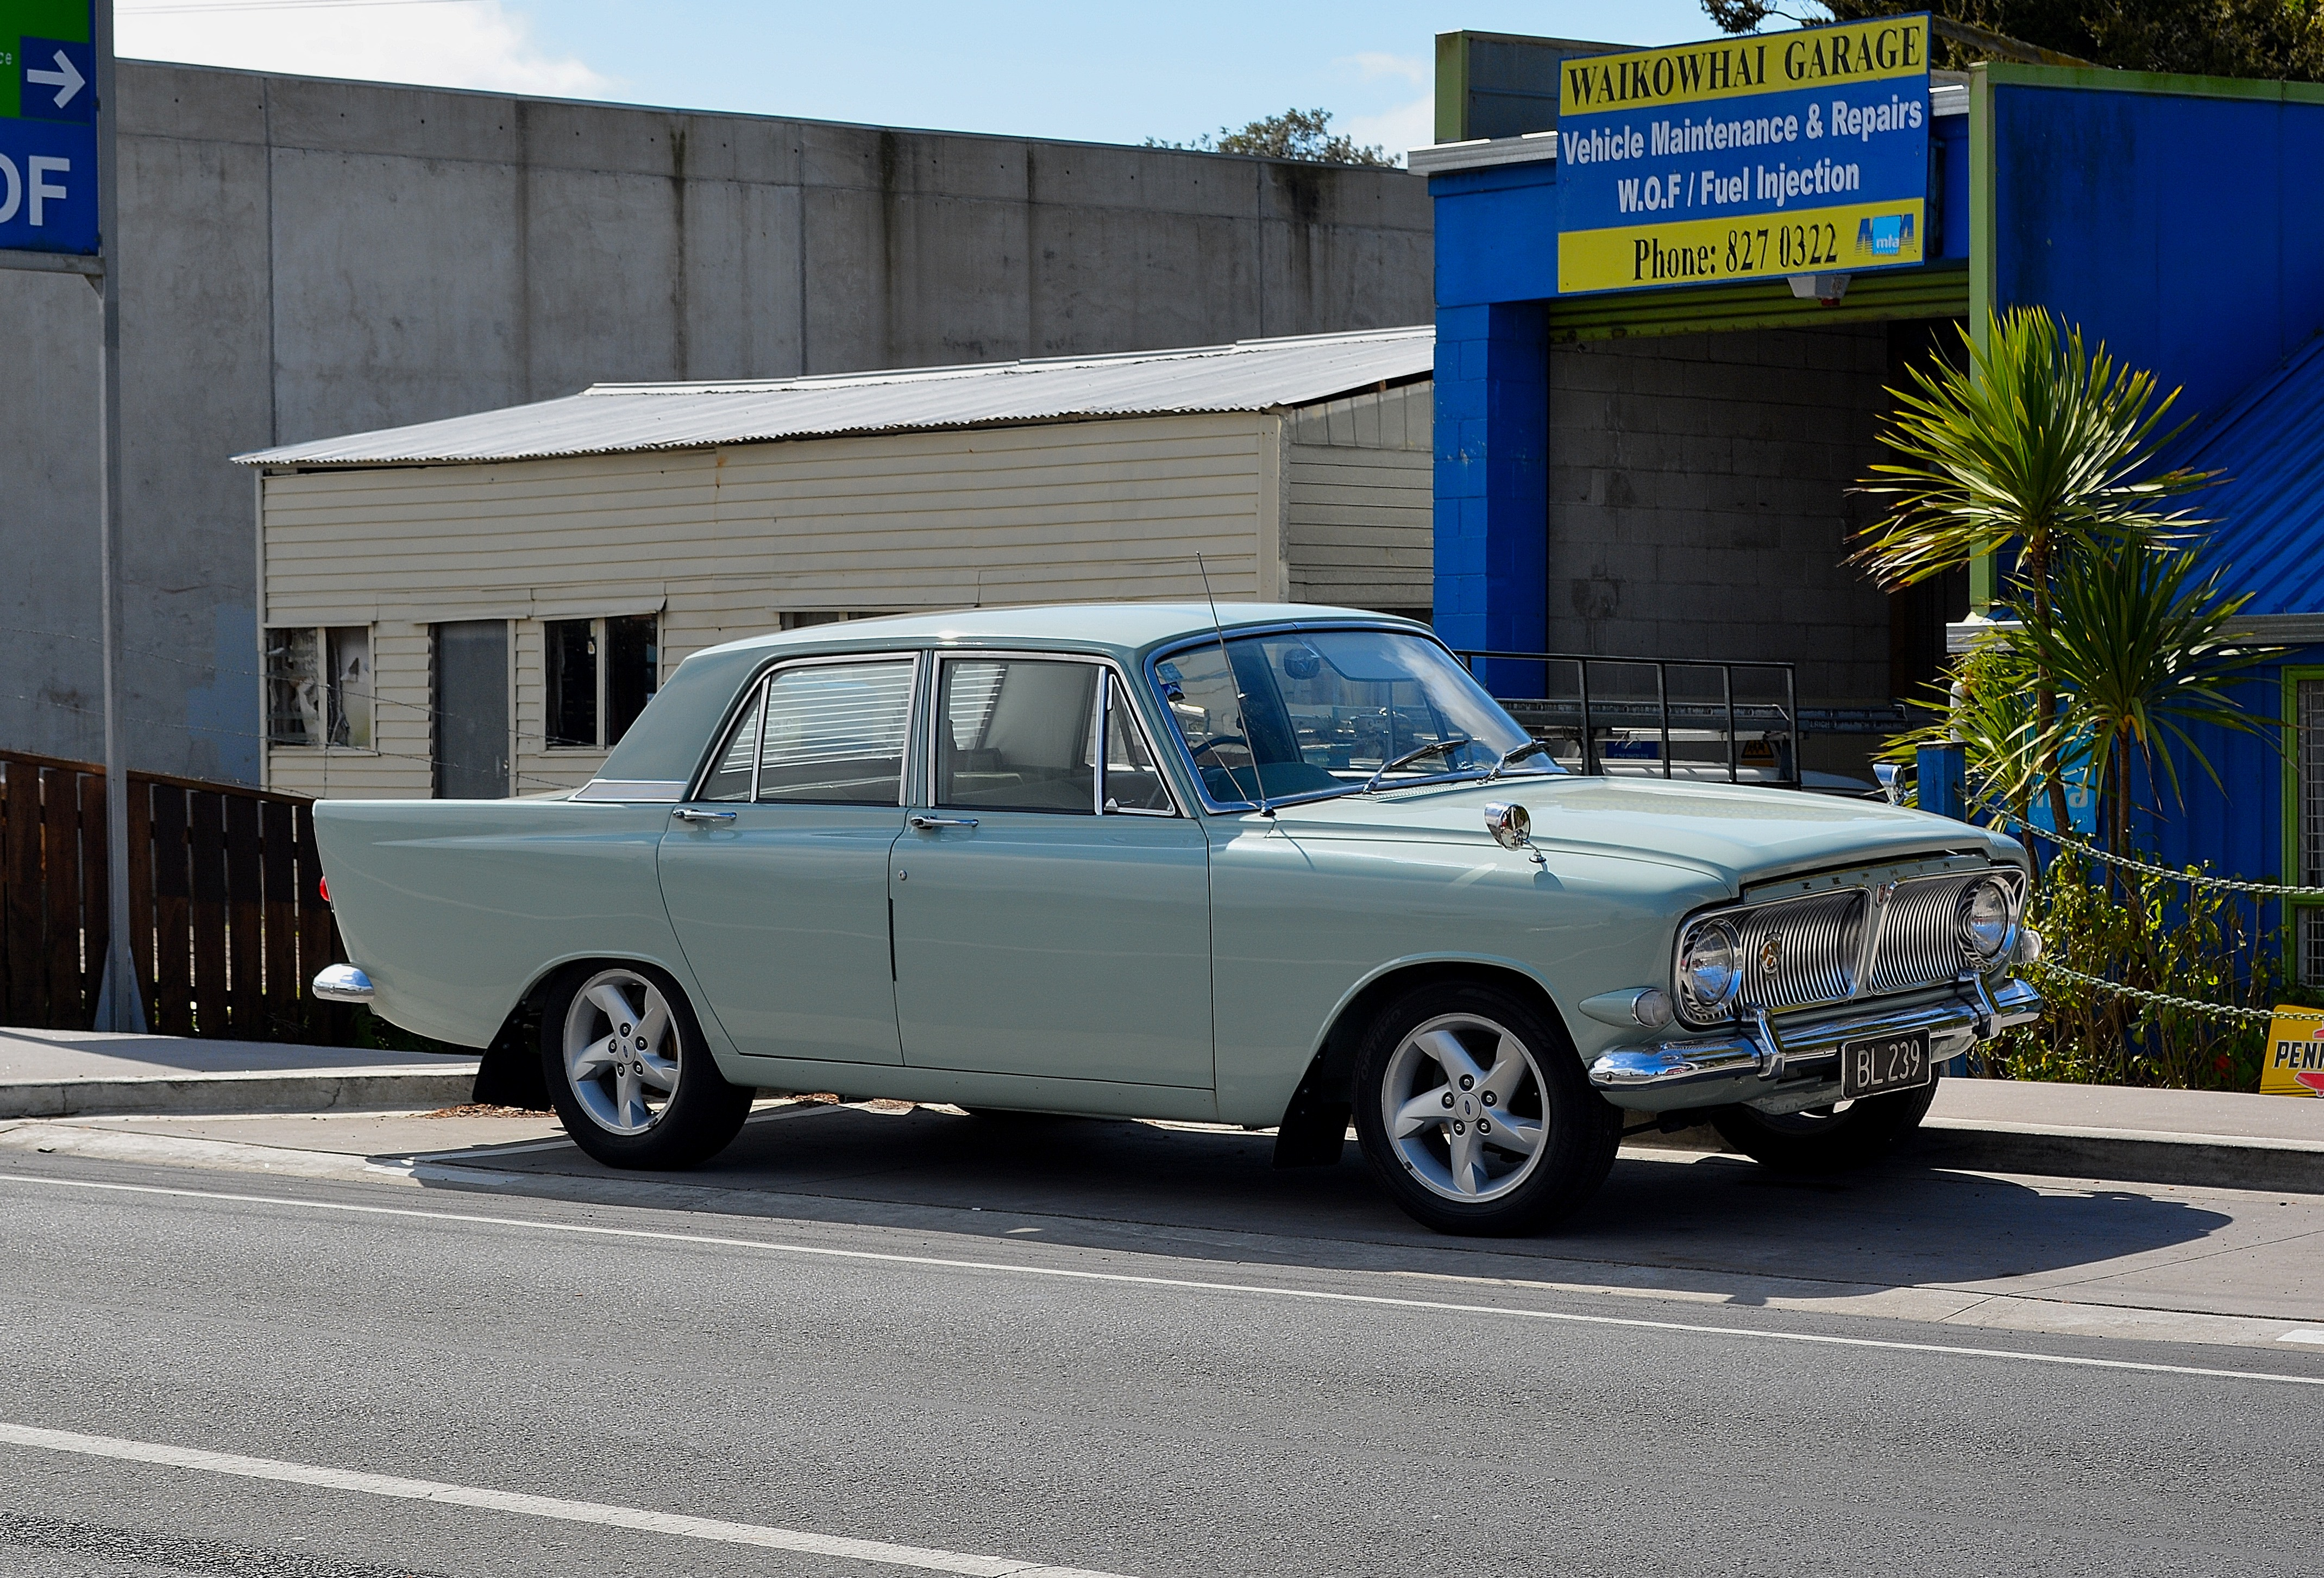 File:1963 Ford Mk3 Zephyr 6 (29382496782) jpg - Wikimedia